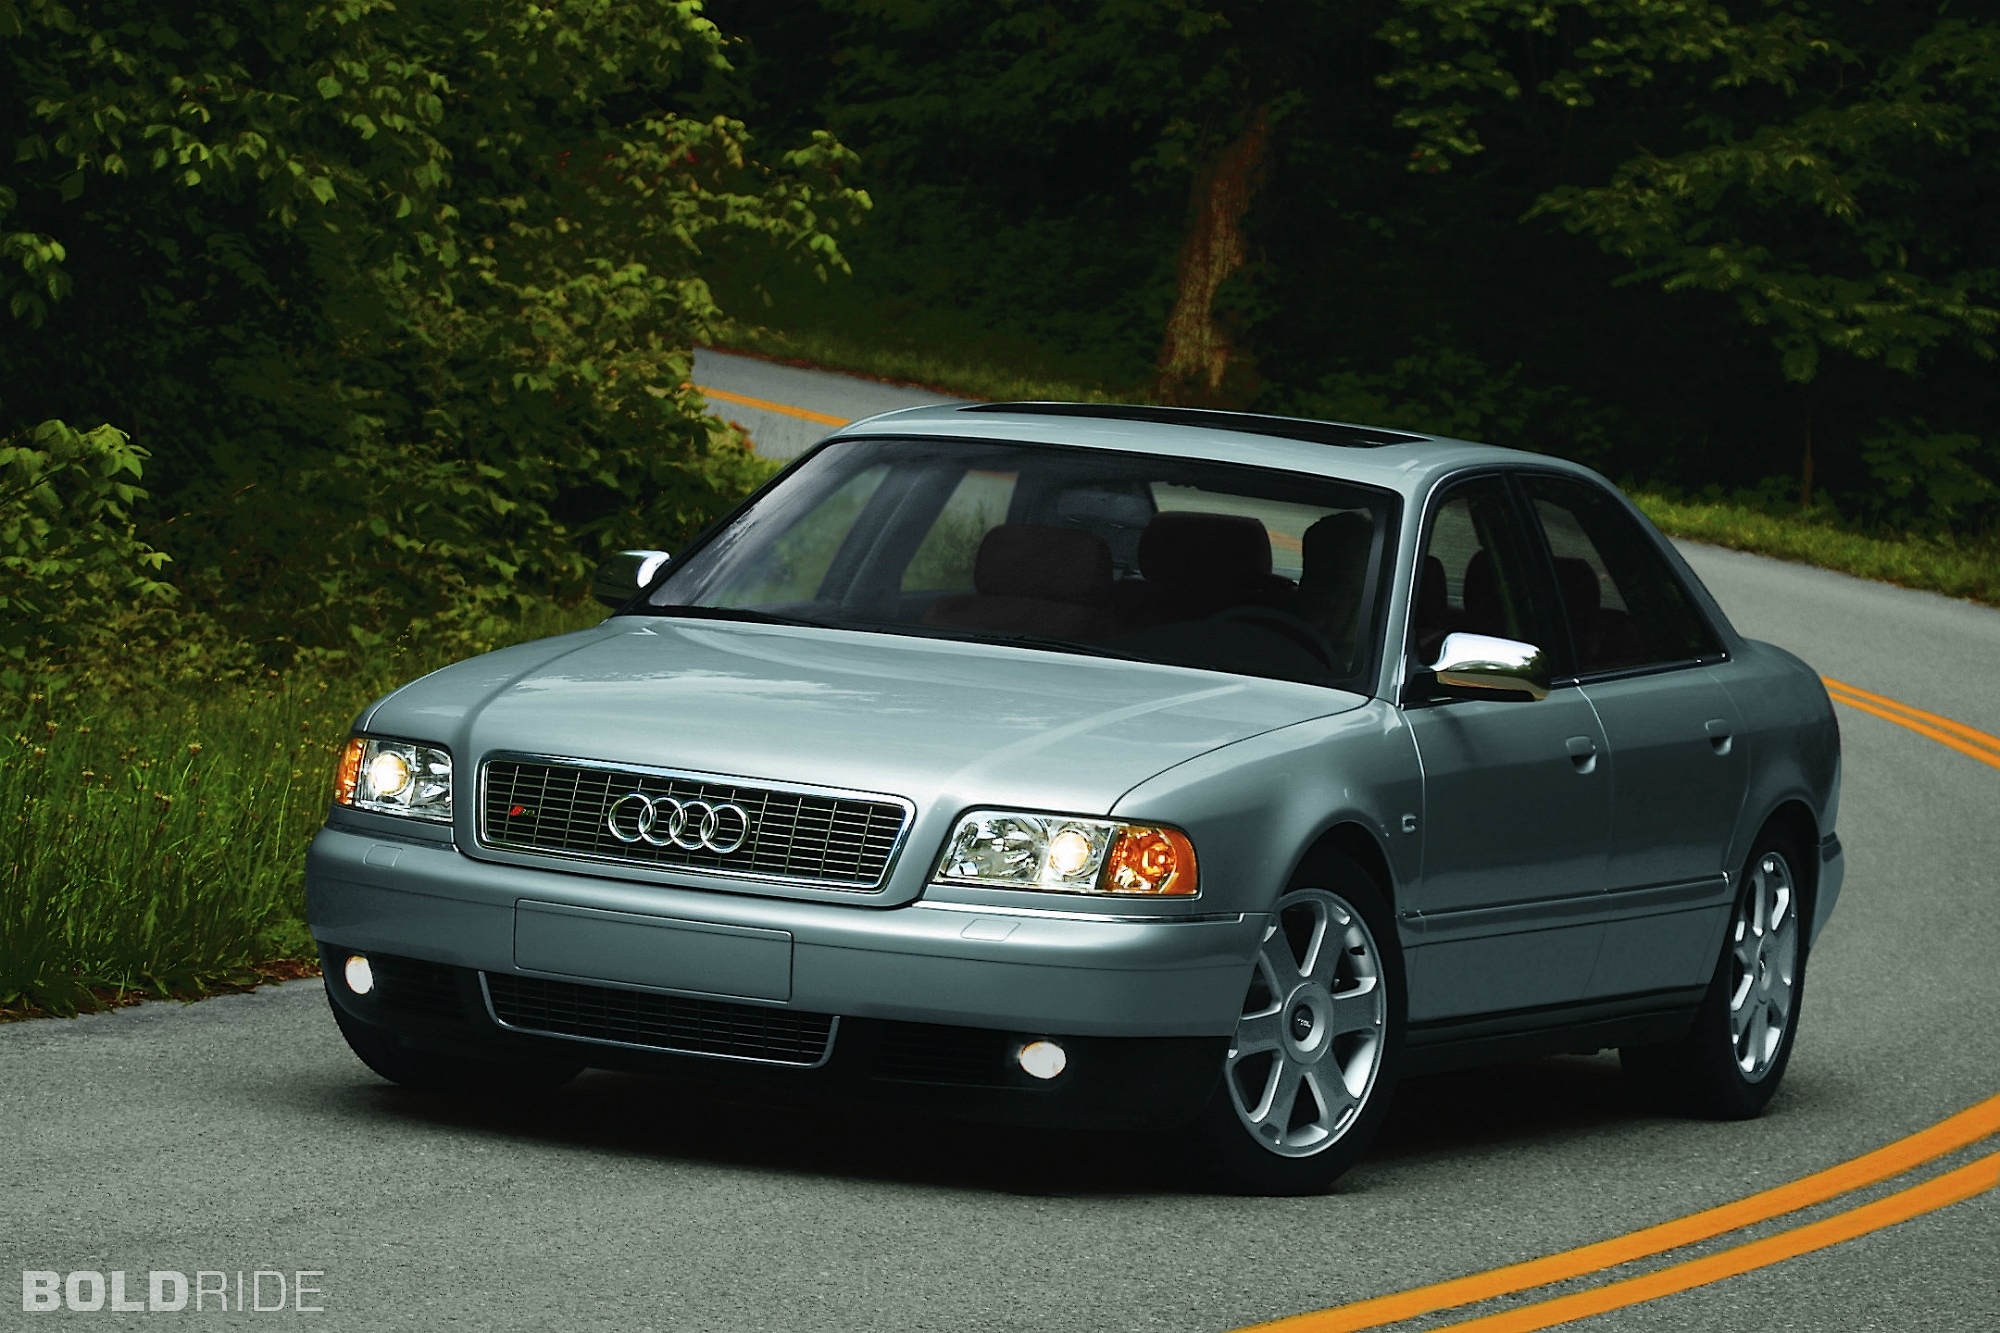 2002 Audi S8 Image 11